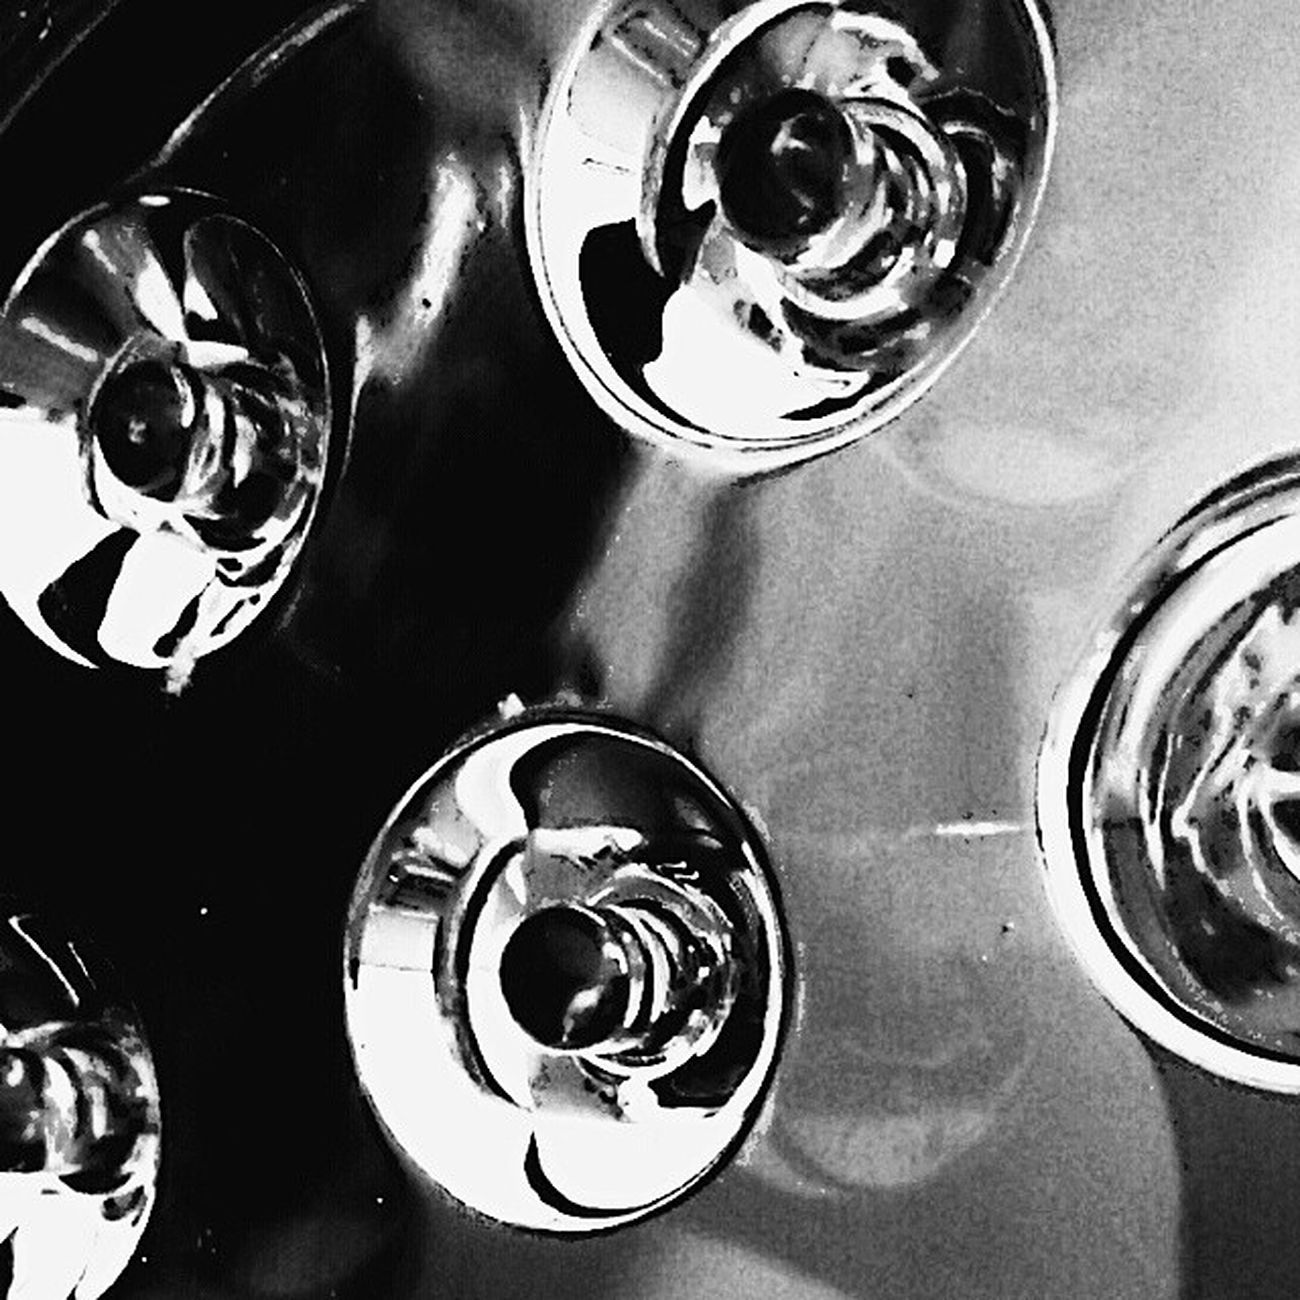 Vscocam Blackandwhite Worl_captures Wu_spain wonderfulworld bnwphoto bnw_universe bnw_abenza bnw blancoynegro whiteandblack lightsandshadows light minimalmood minimal_shot minimalismo minimal_perfection minimal minimalism ig_today instagramers instafun instaart instaabenza